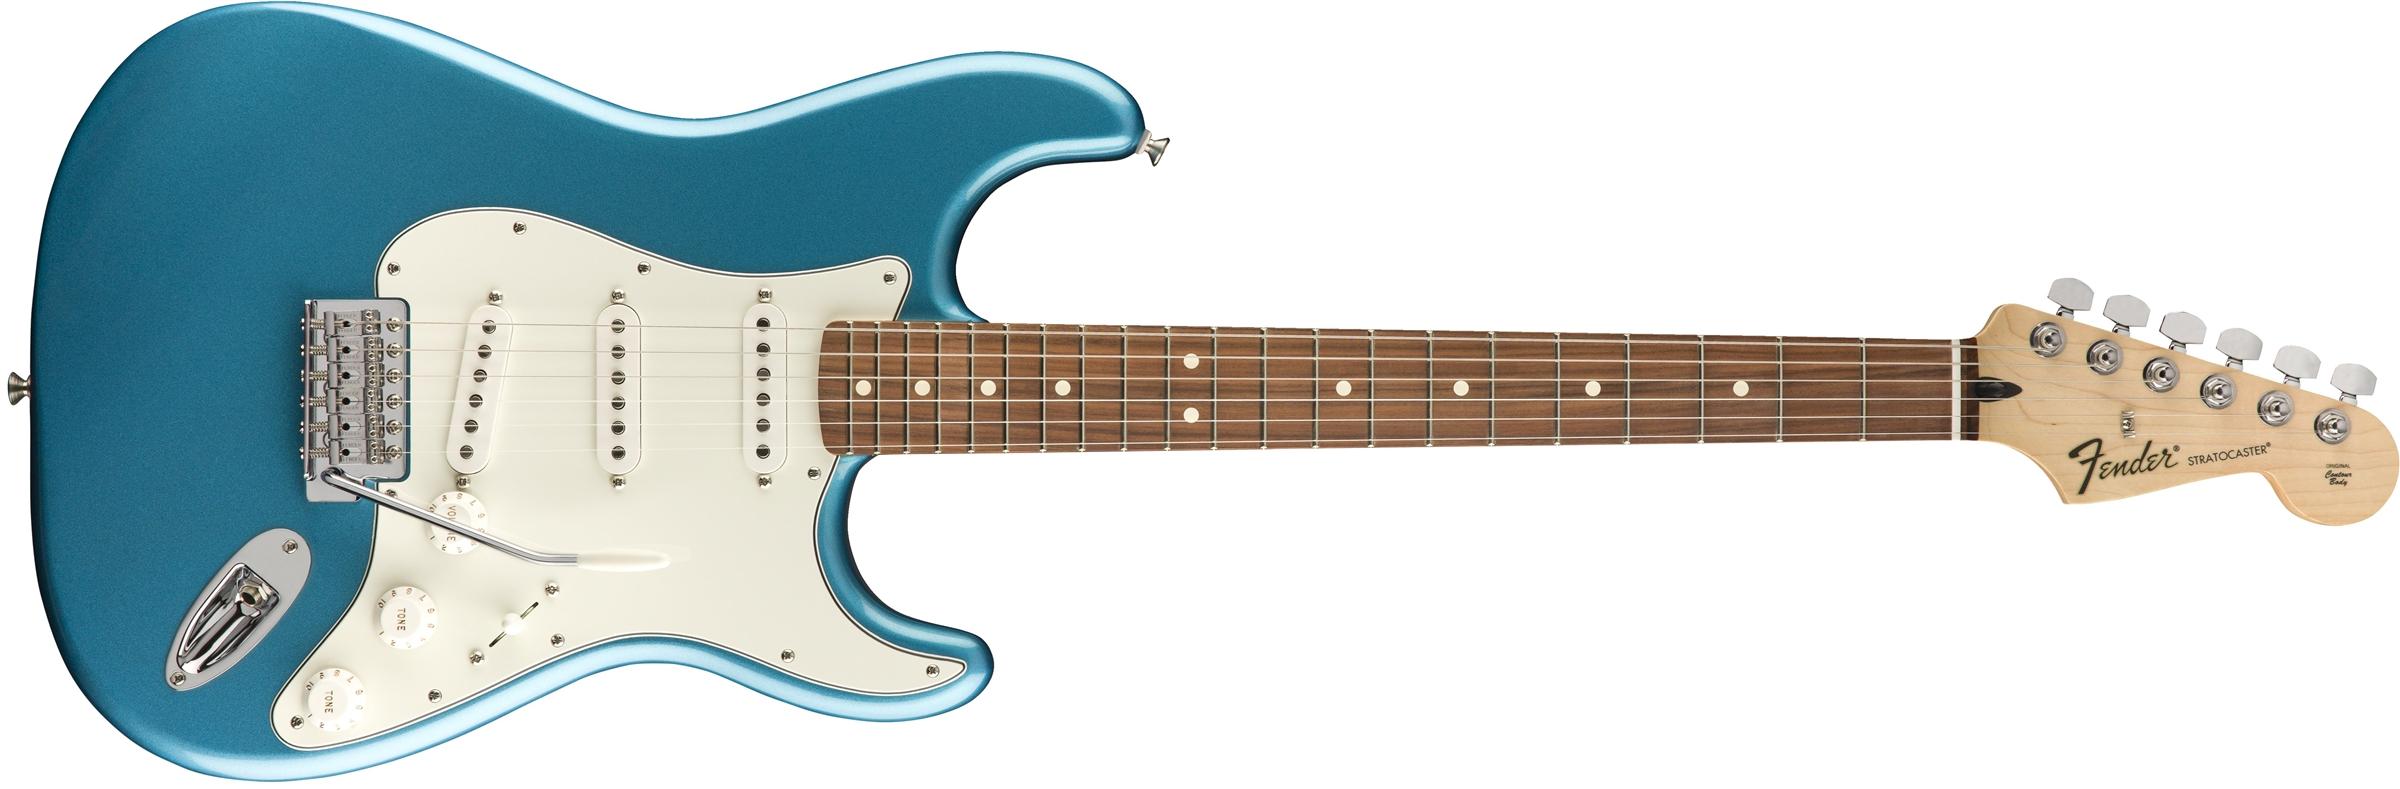 Standard Stratocaster 174 Fender Electric Guitars